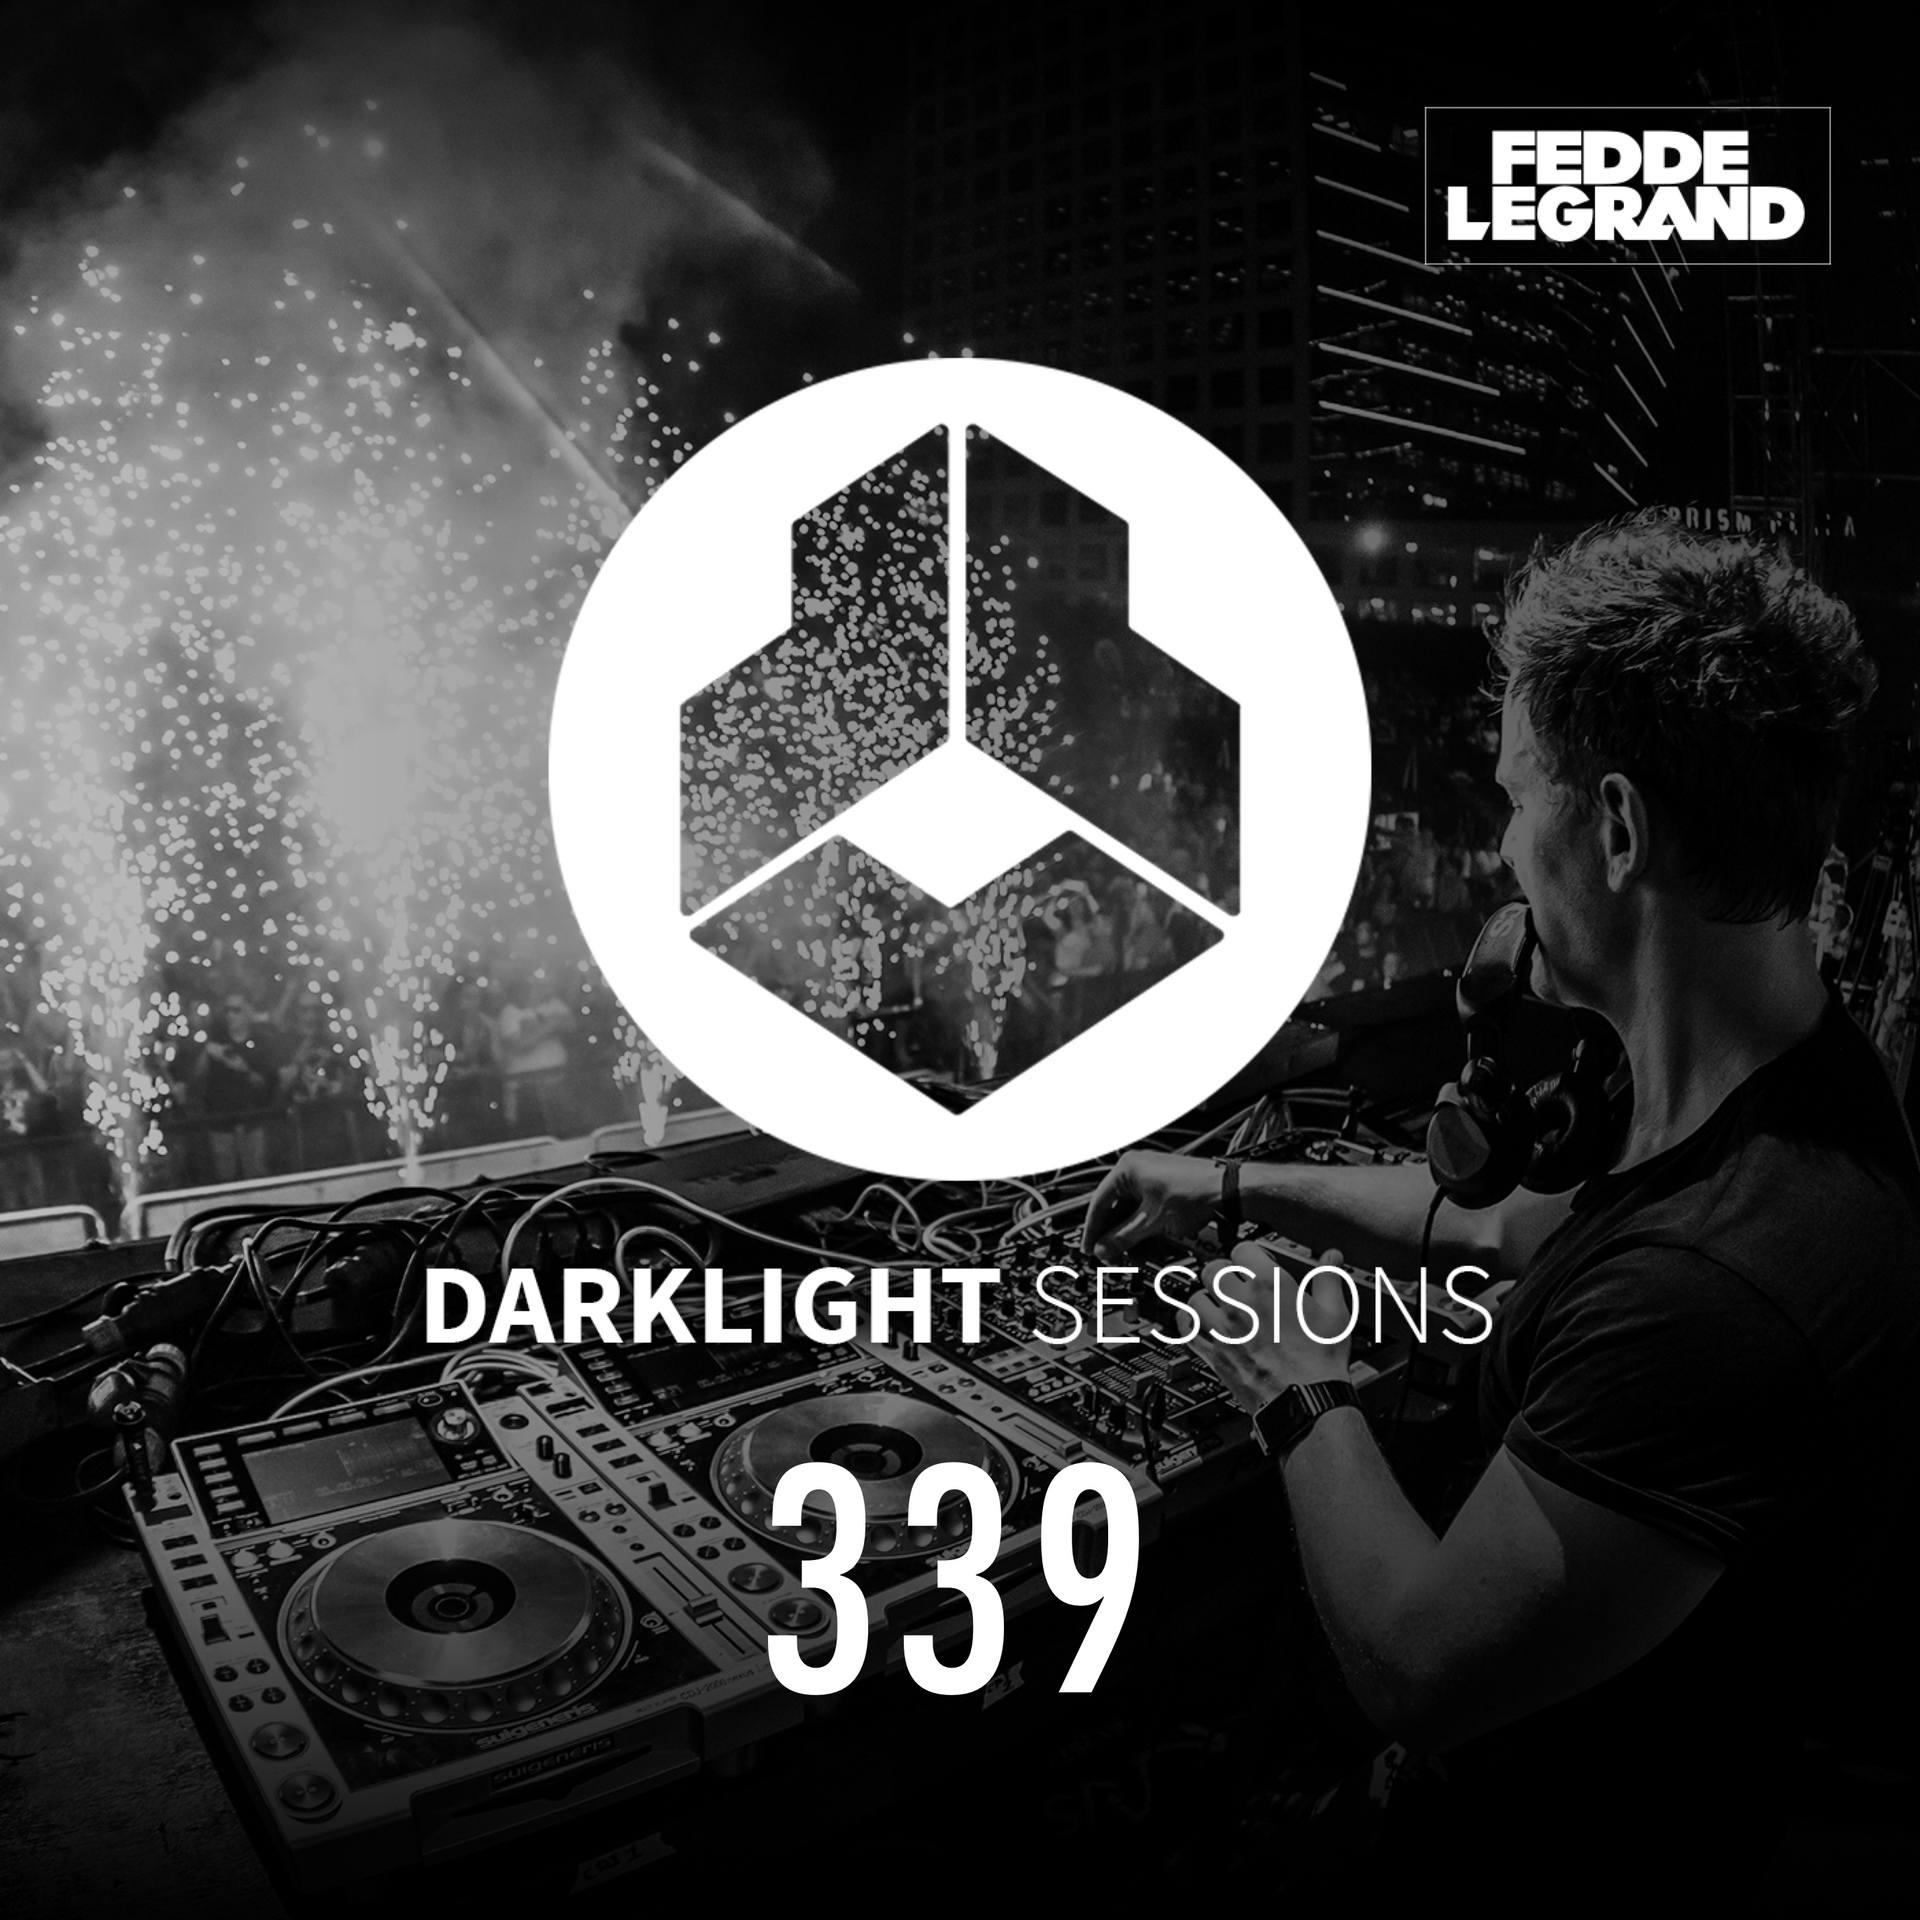 Darklight Sessions 339